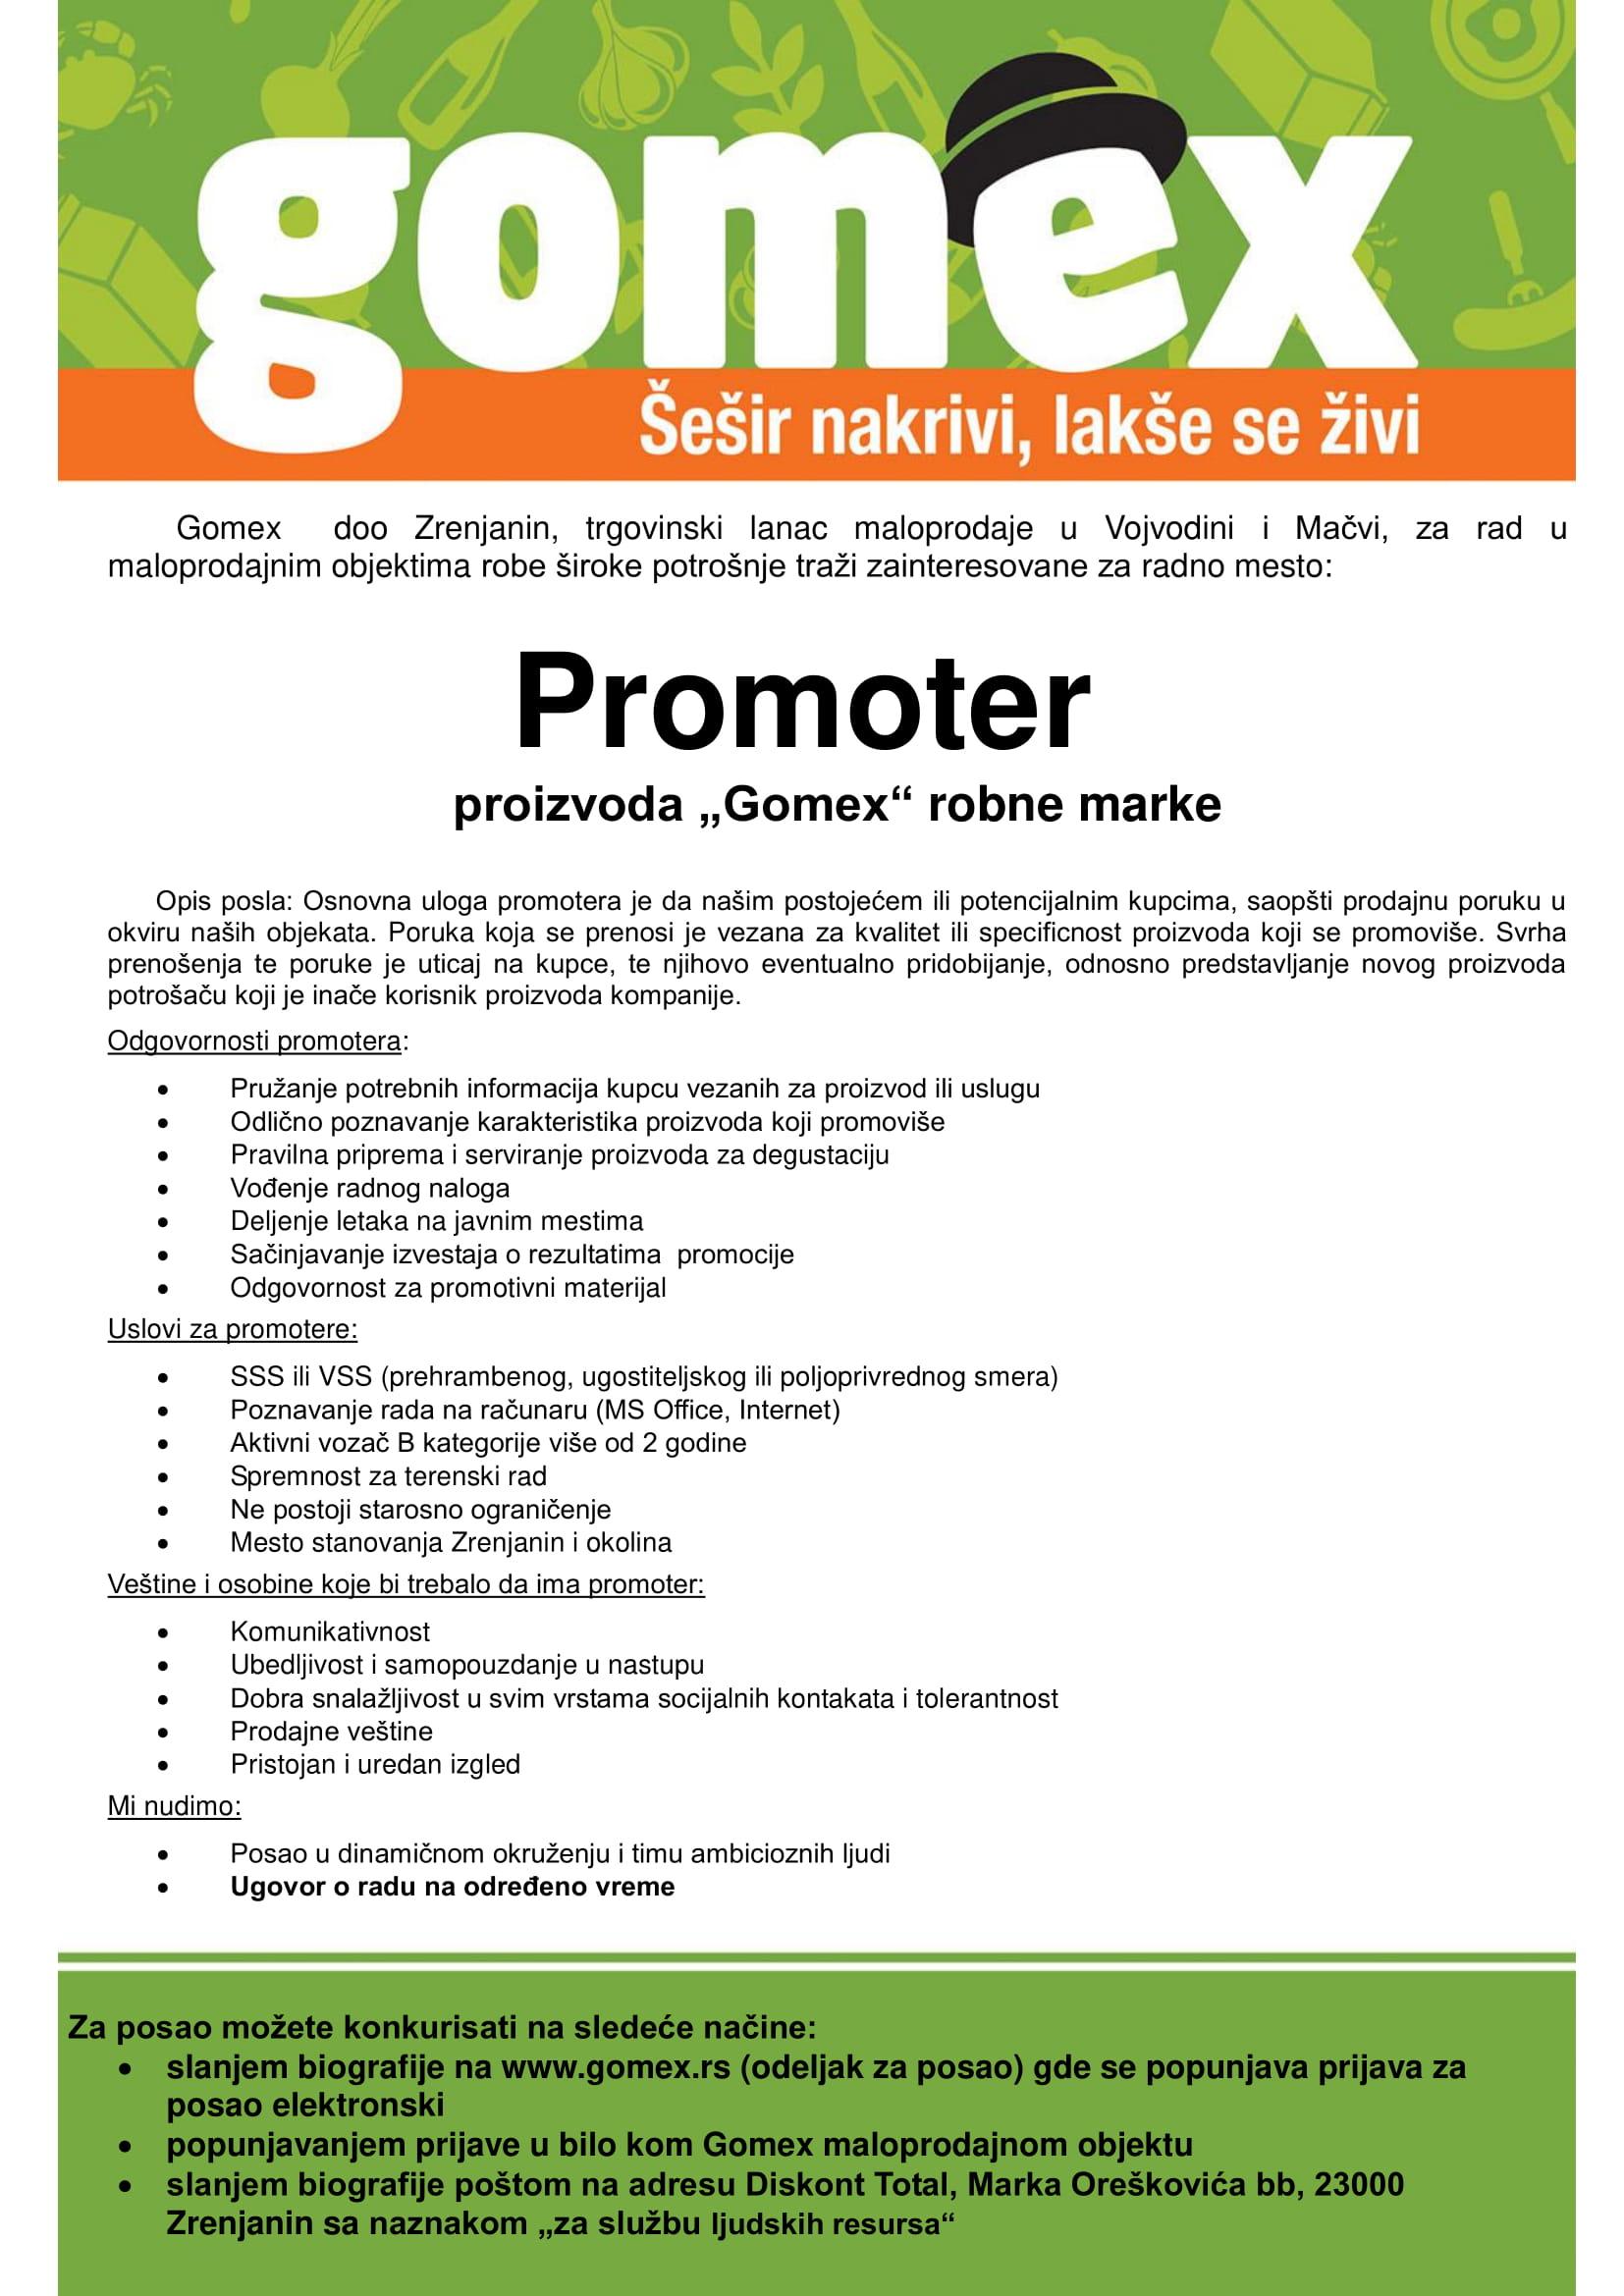 Promoter / Promoterka